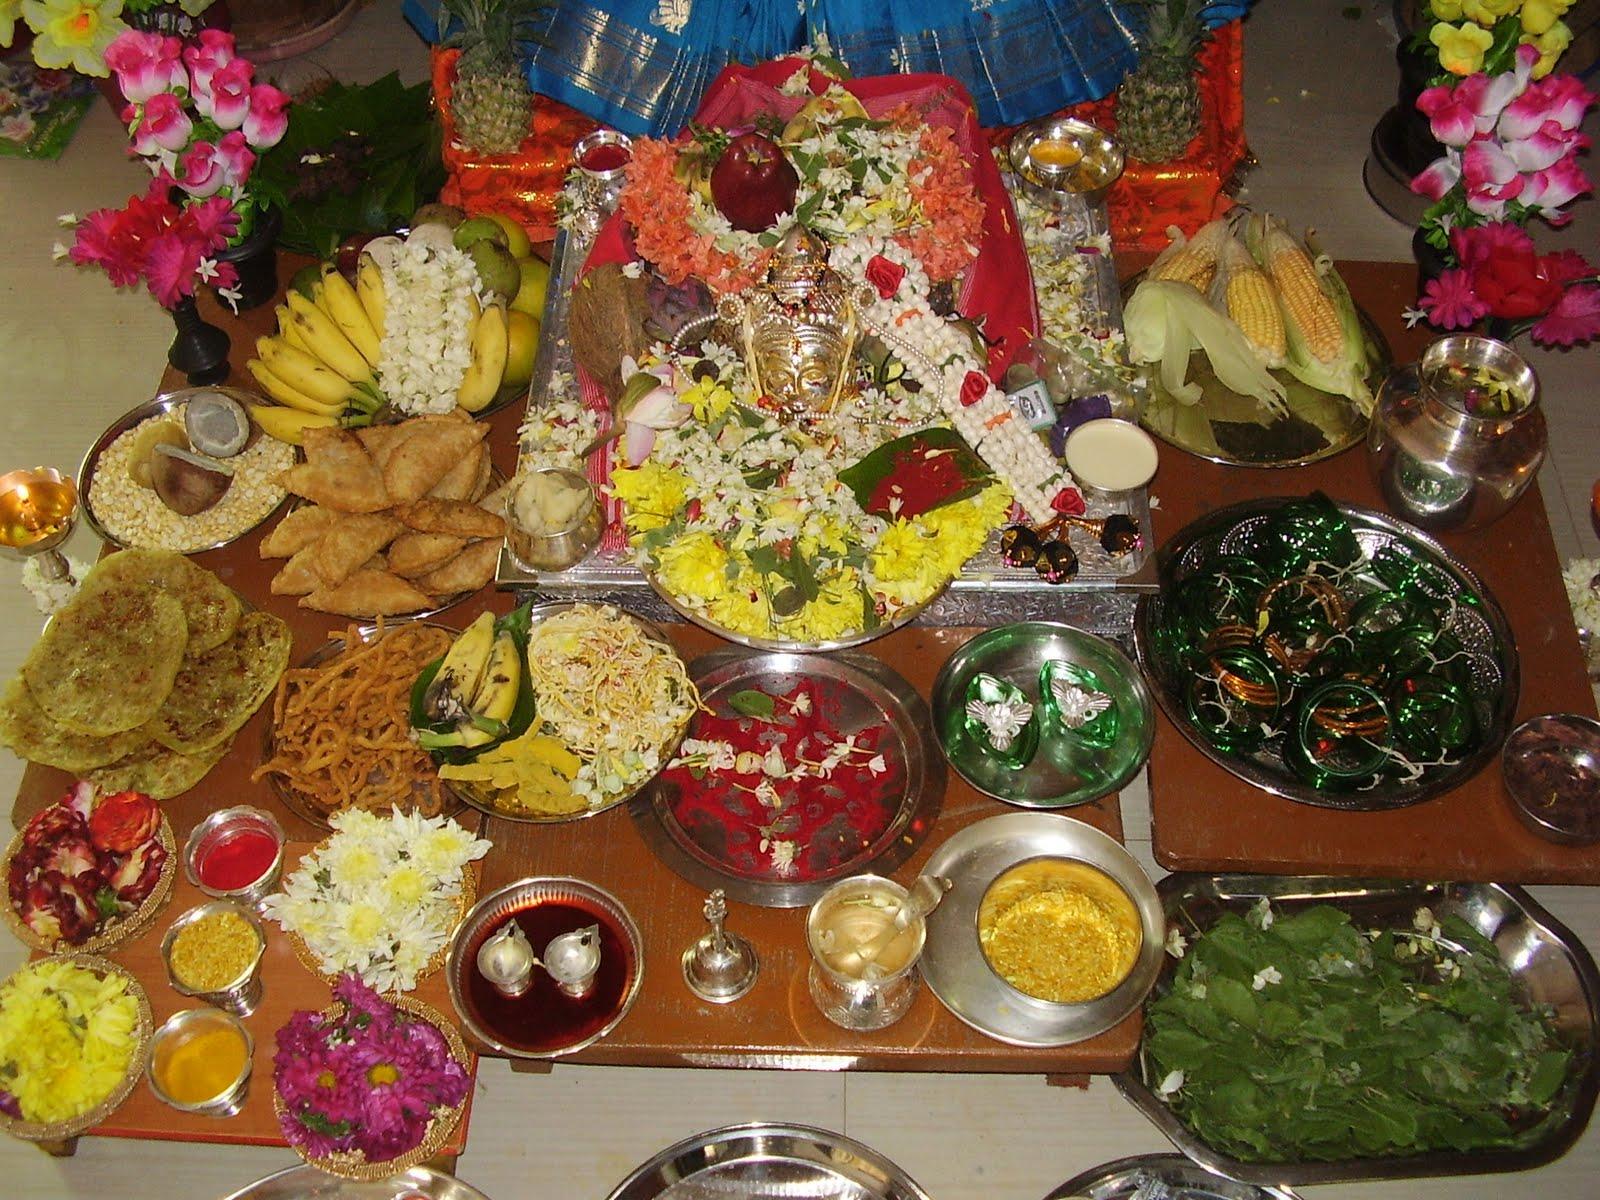 varalakshmi vratham pooja vidhanam in tamil pdf